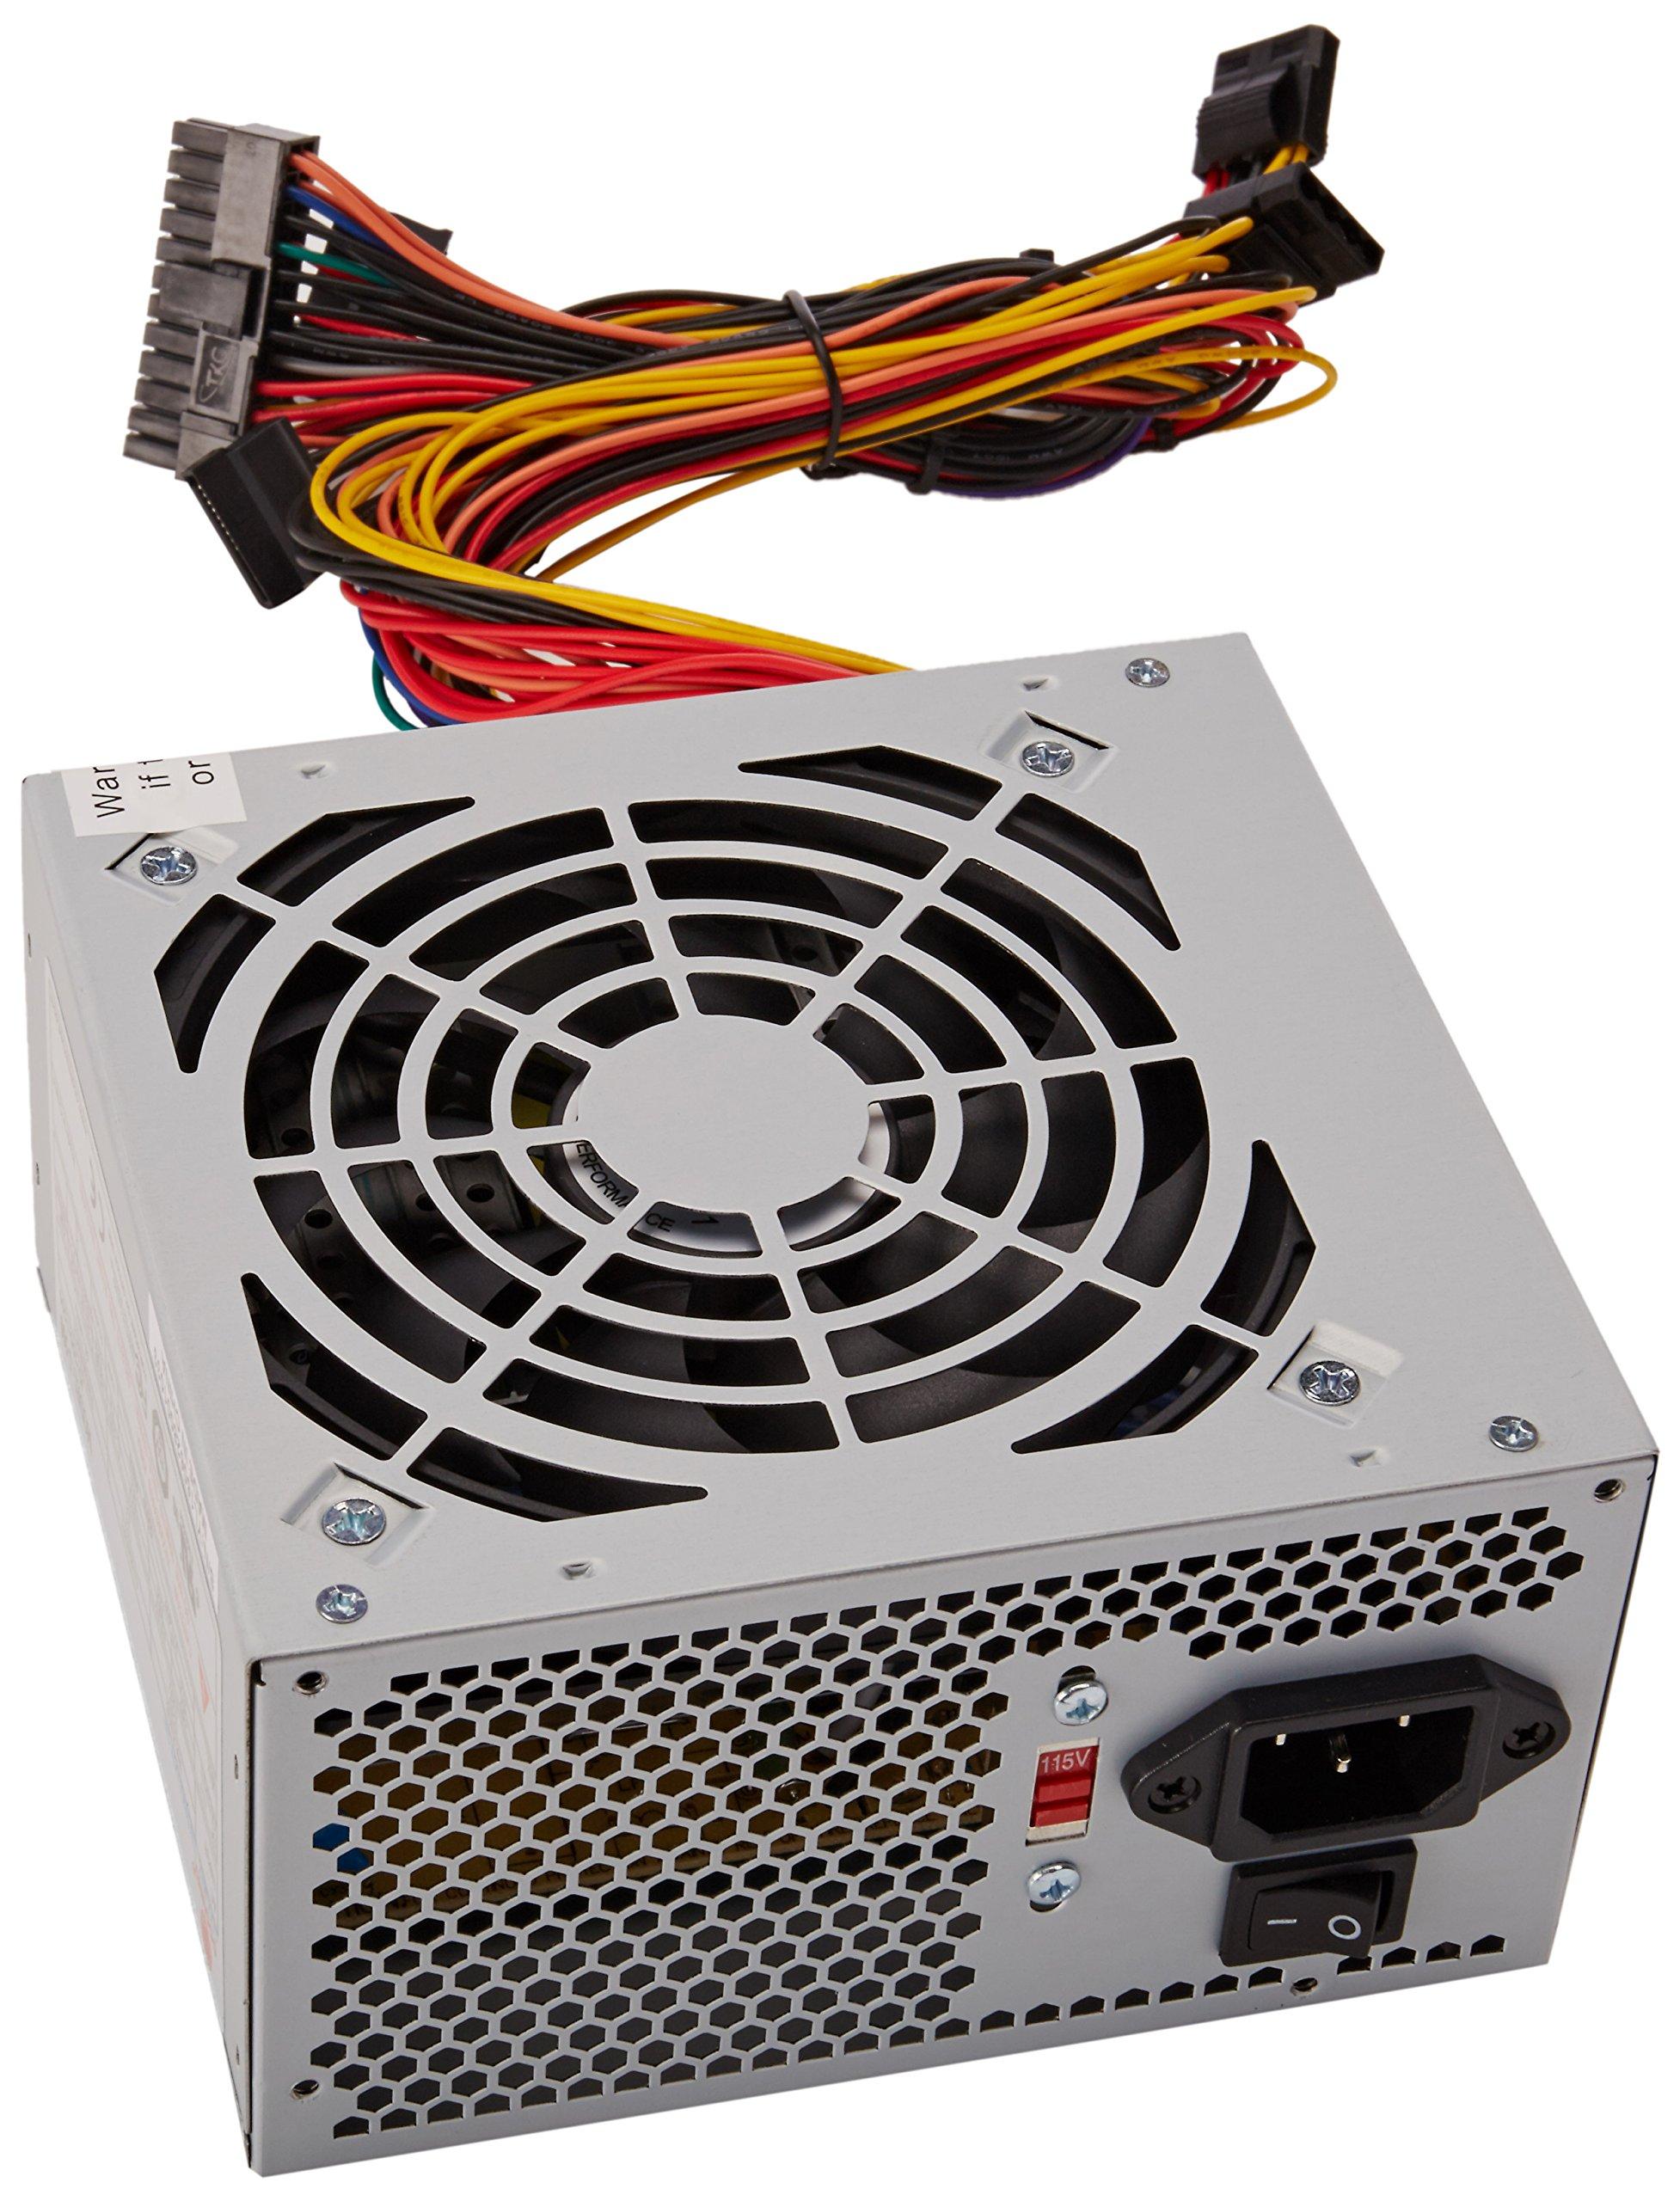 Coolmax I-500 500W ATX 12V V2.0 Power Supply by Coolmax